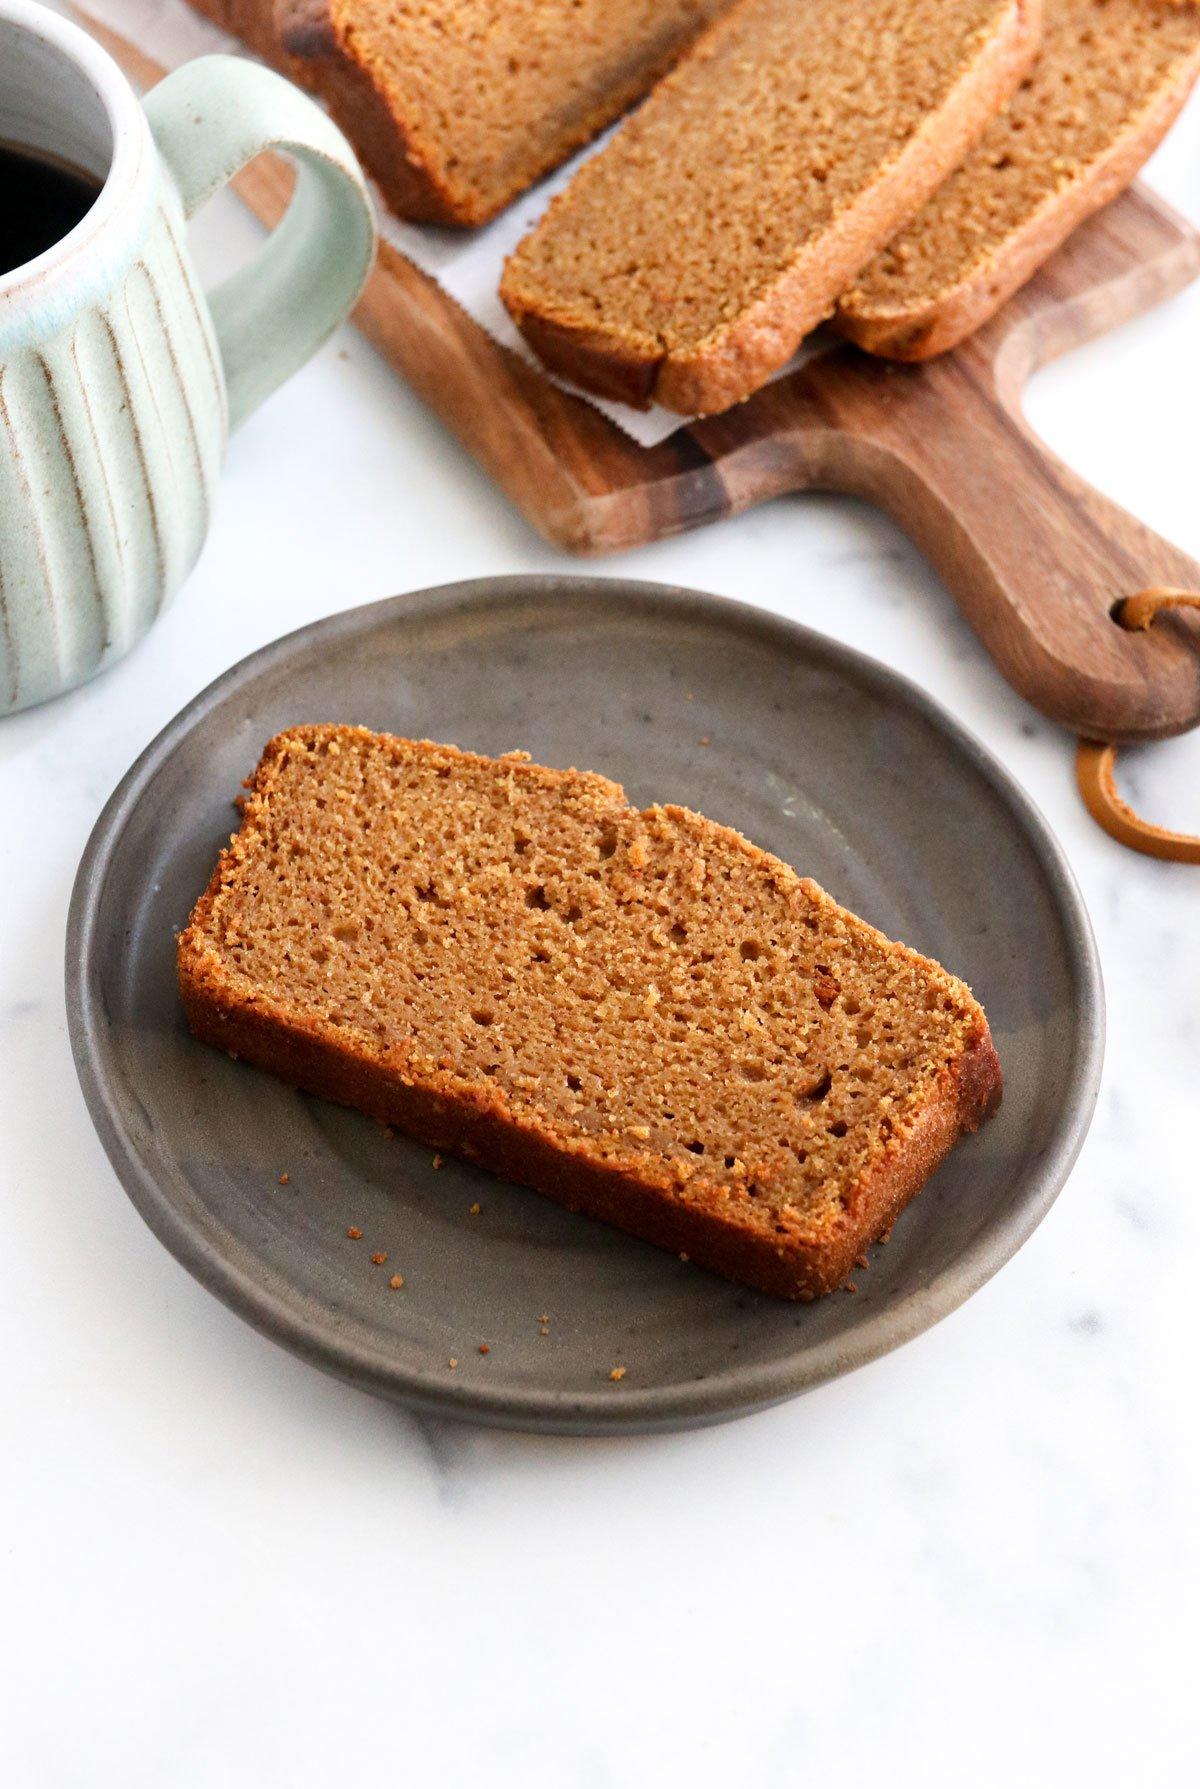 slice of pumpkin bread on black plate